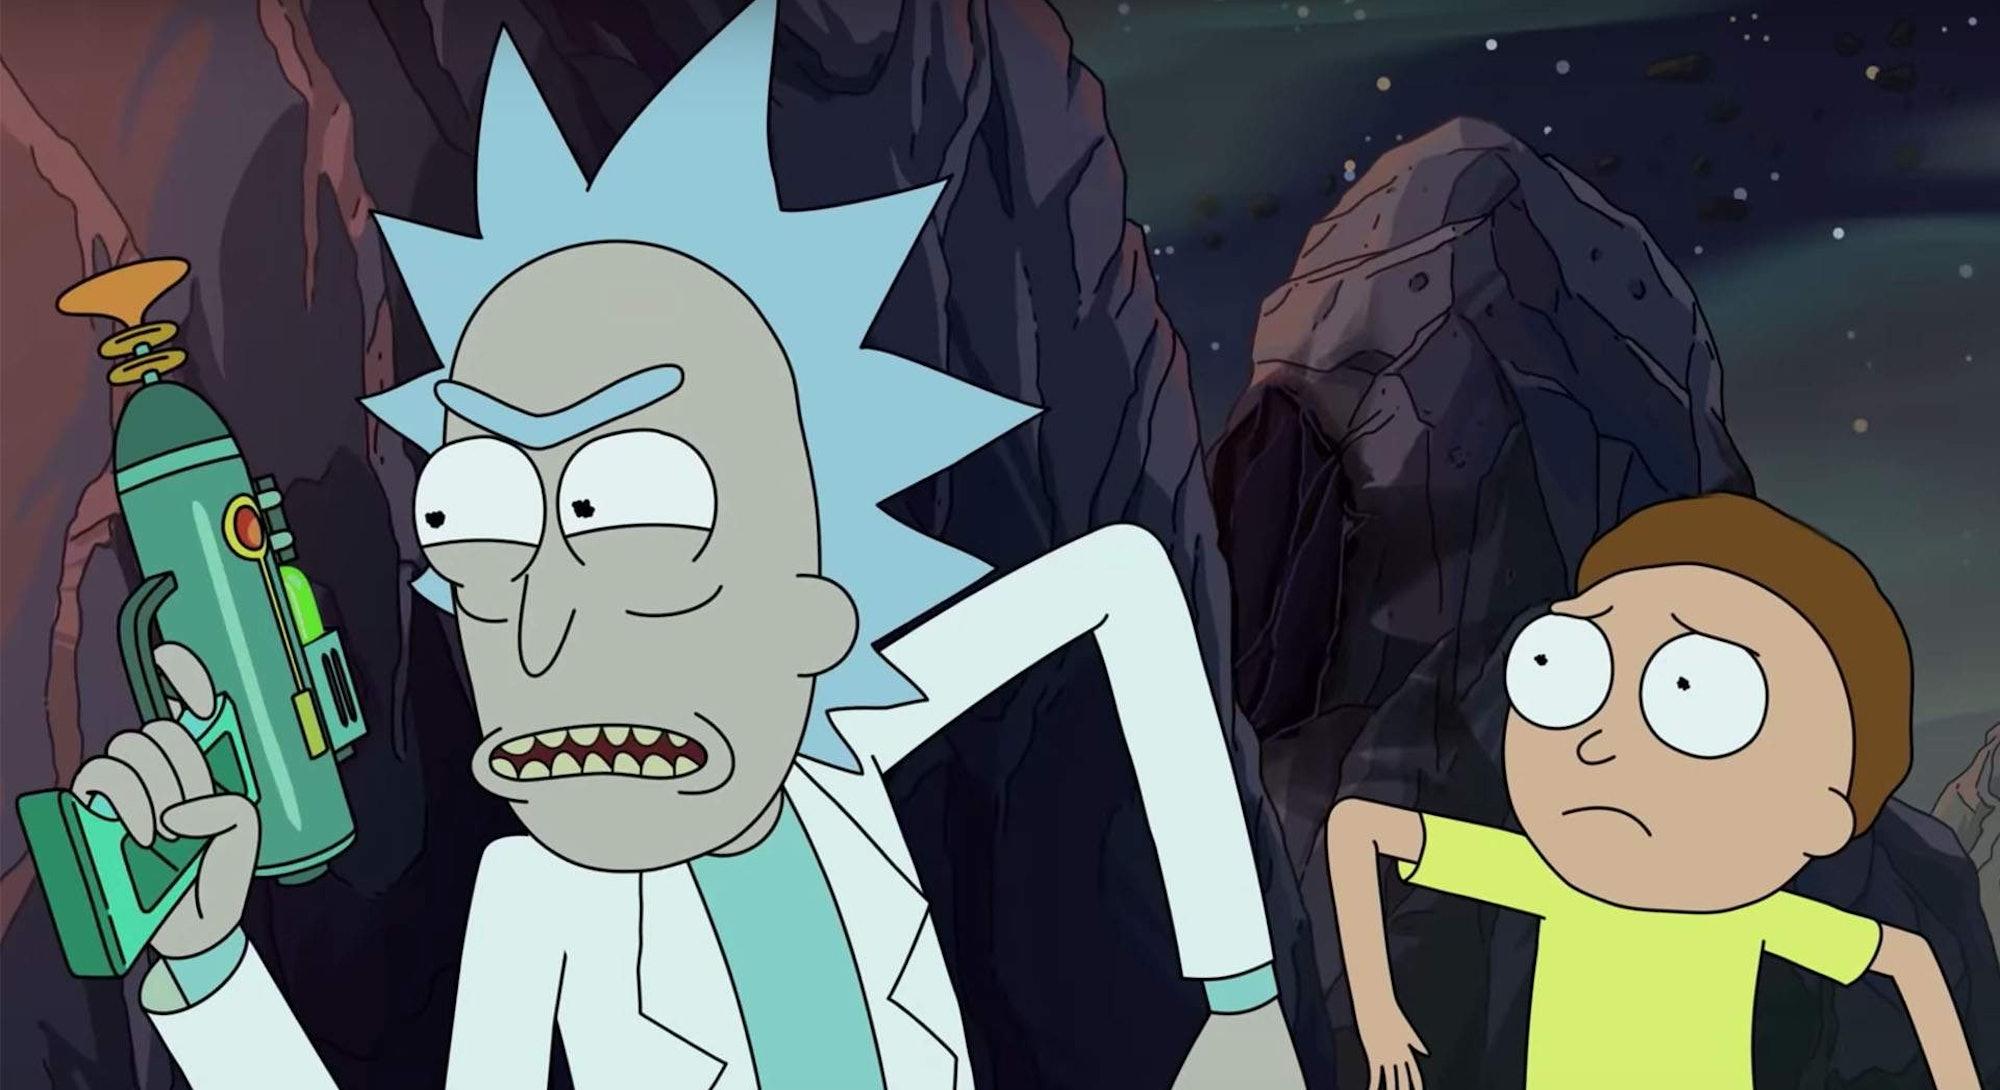 rick and morty season 4 episode 9 - photo #20